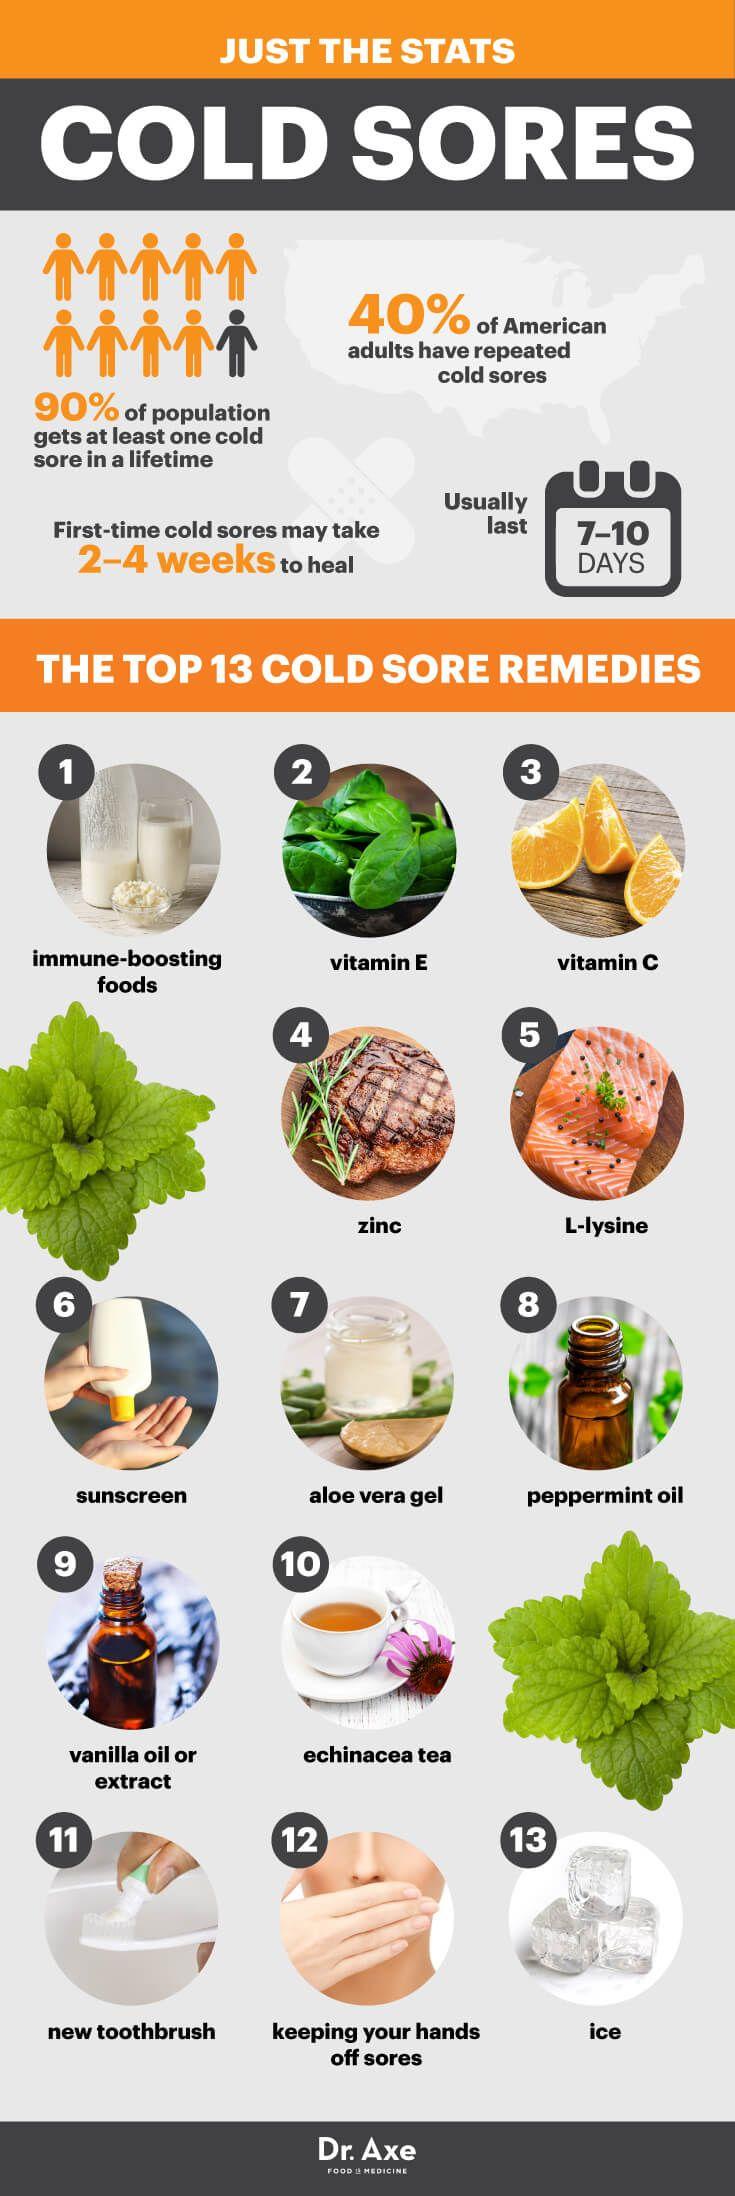 Best 25 cold treatment ideas on pinterest best medicine for best 25 cold treatment ideas on pinterest best medicine for cold treatment of aids and ice pad ccuart Images